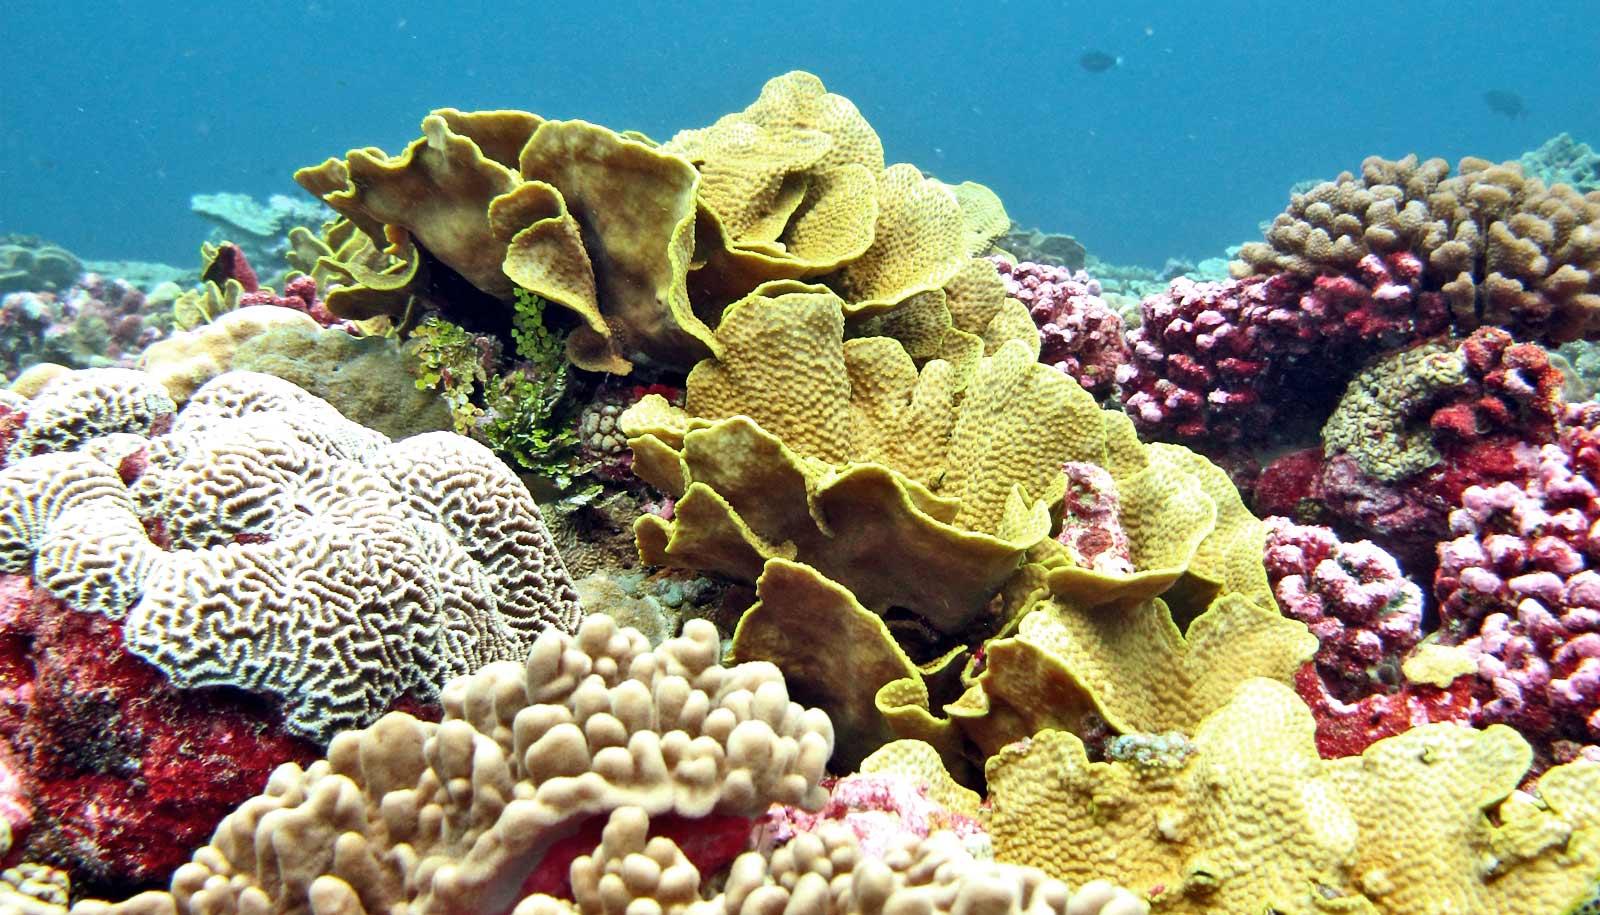 'Refugee corals' move to escape warming seas